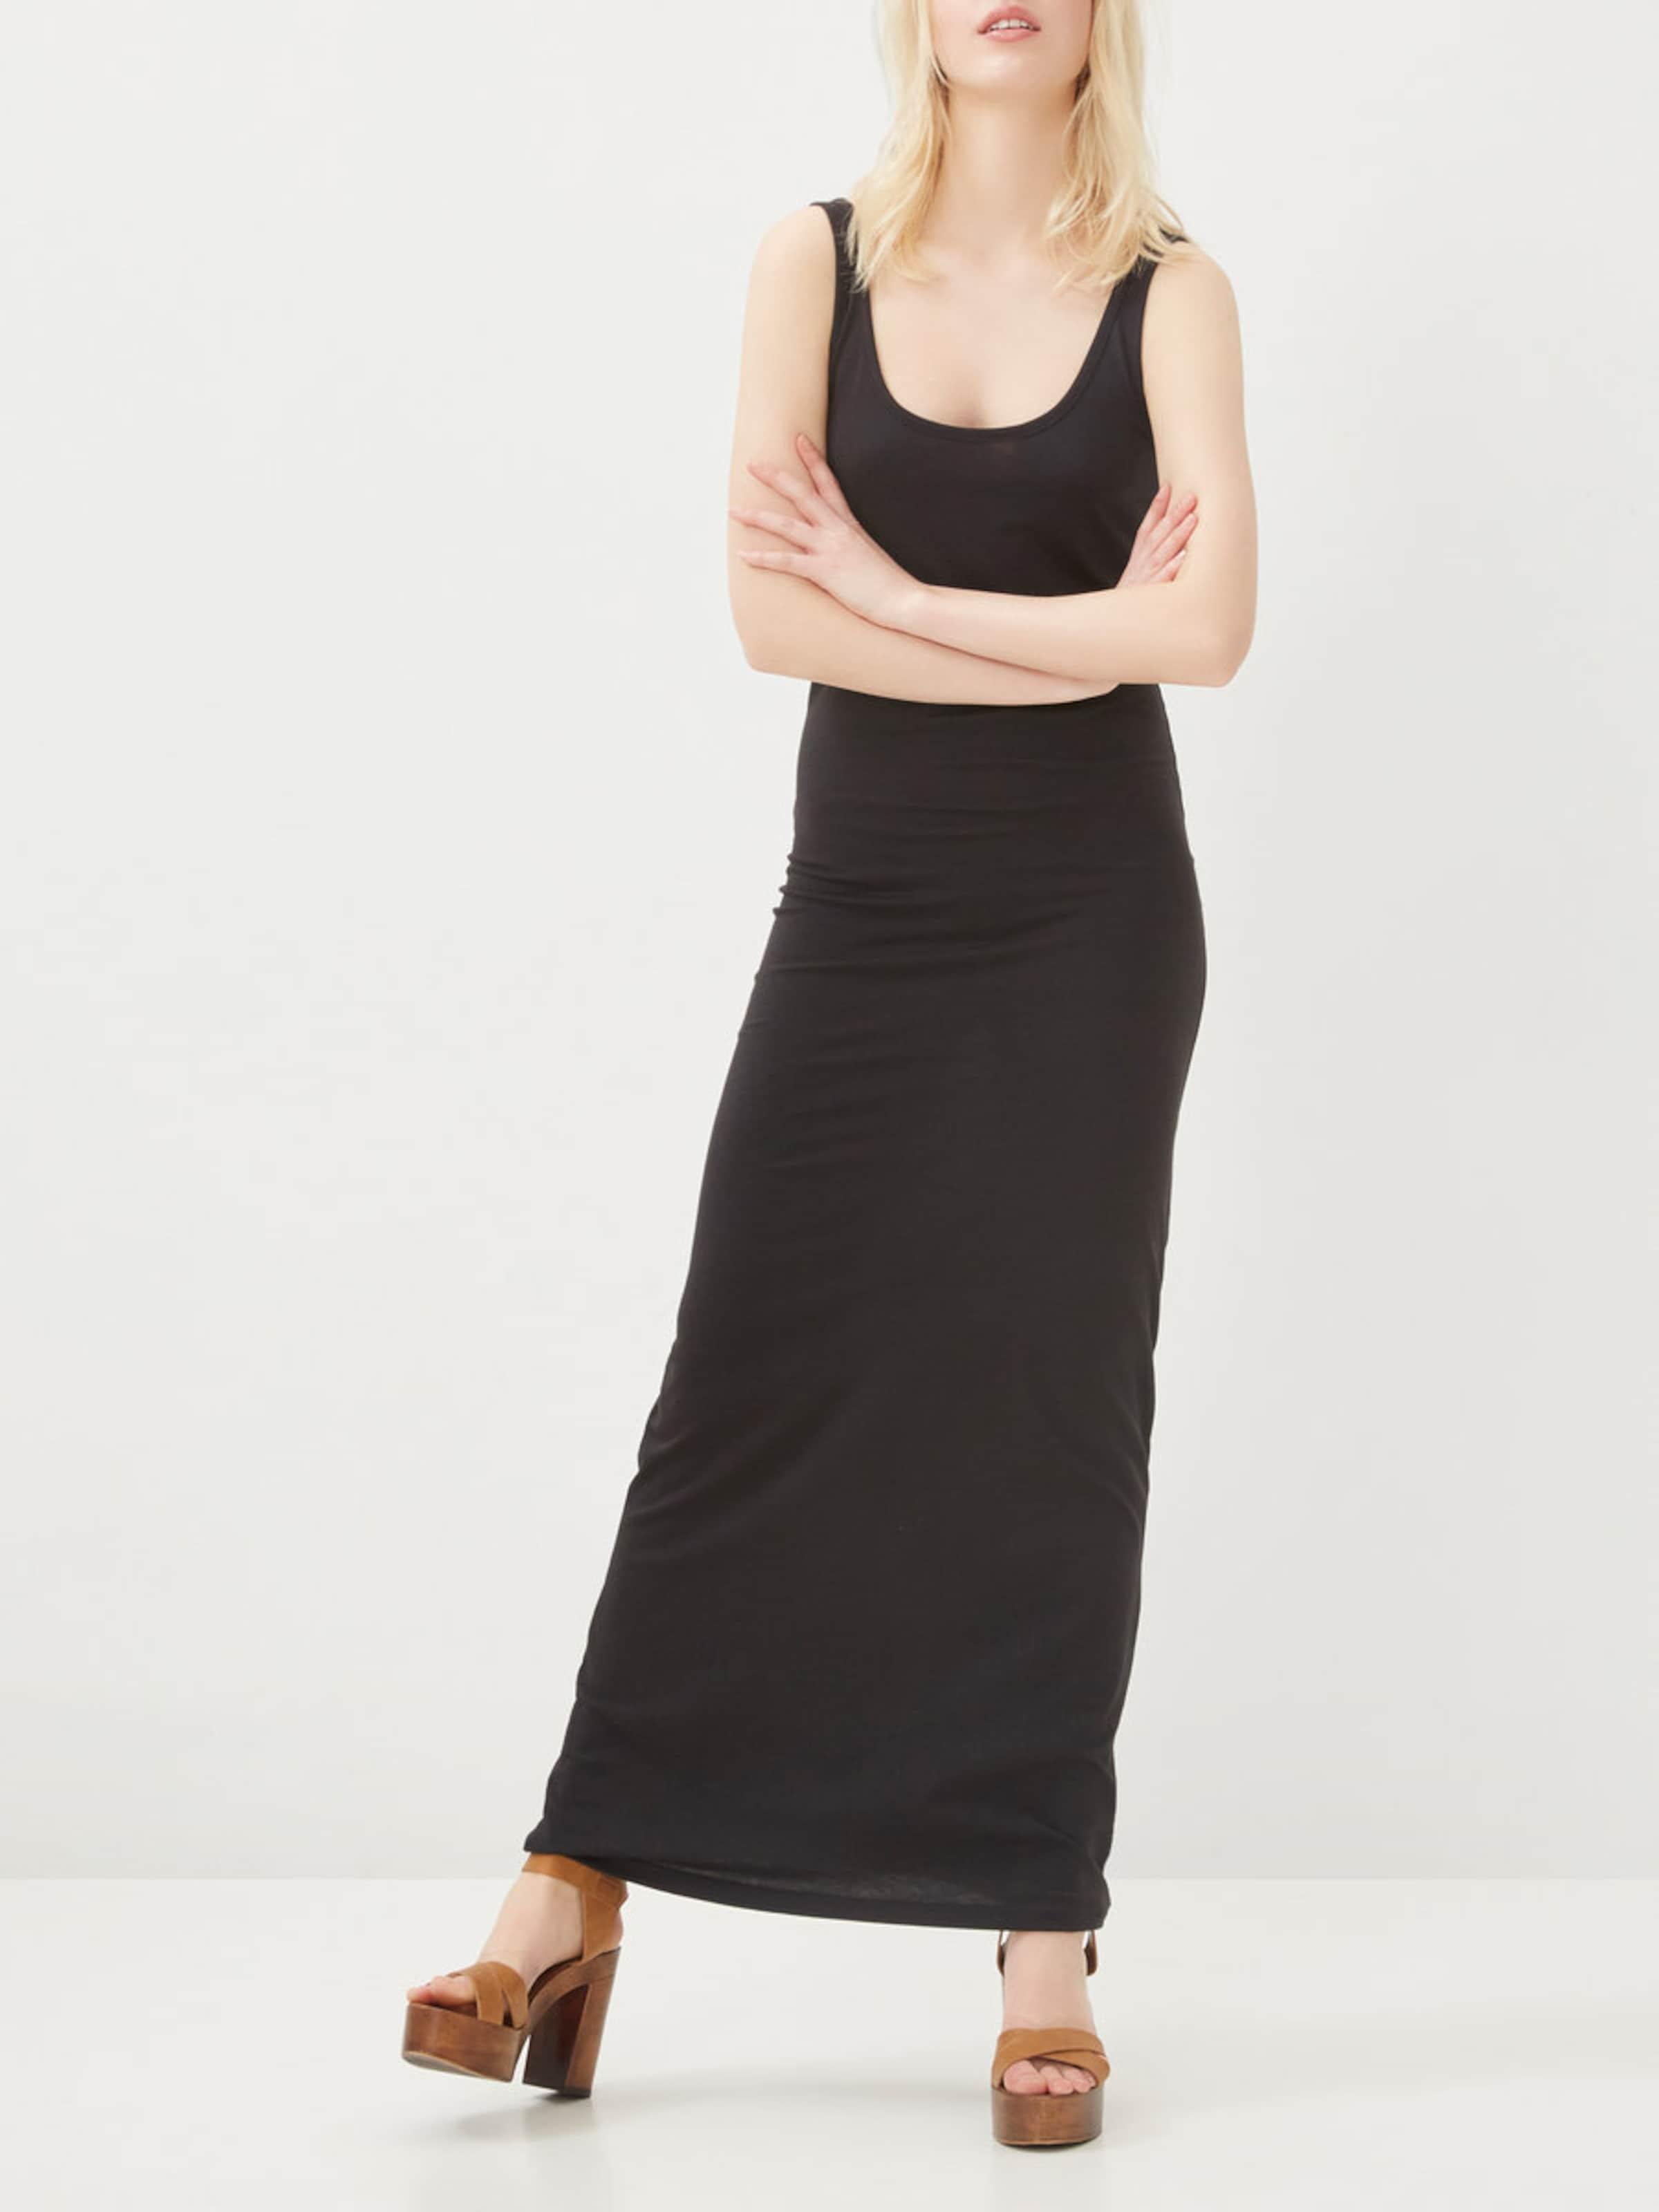 VERO MODA Jerseykleid »Nanna« Rabatt-Websites Verkauf Für Billig Verkauf 2018 Neue g7vrjBR